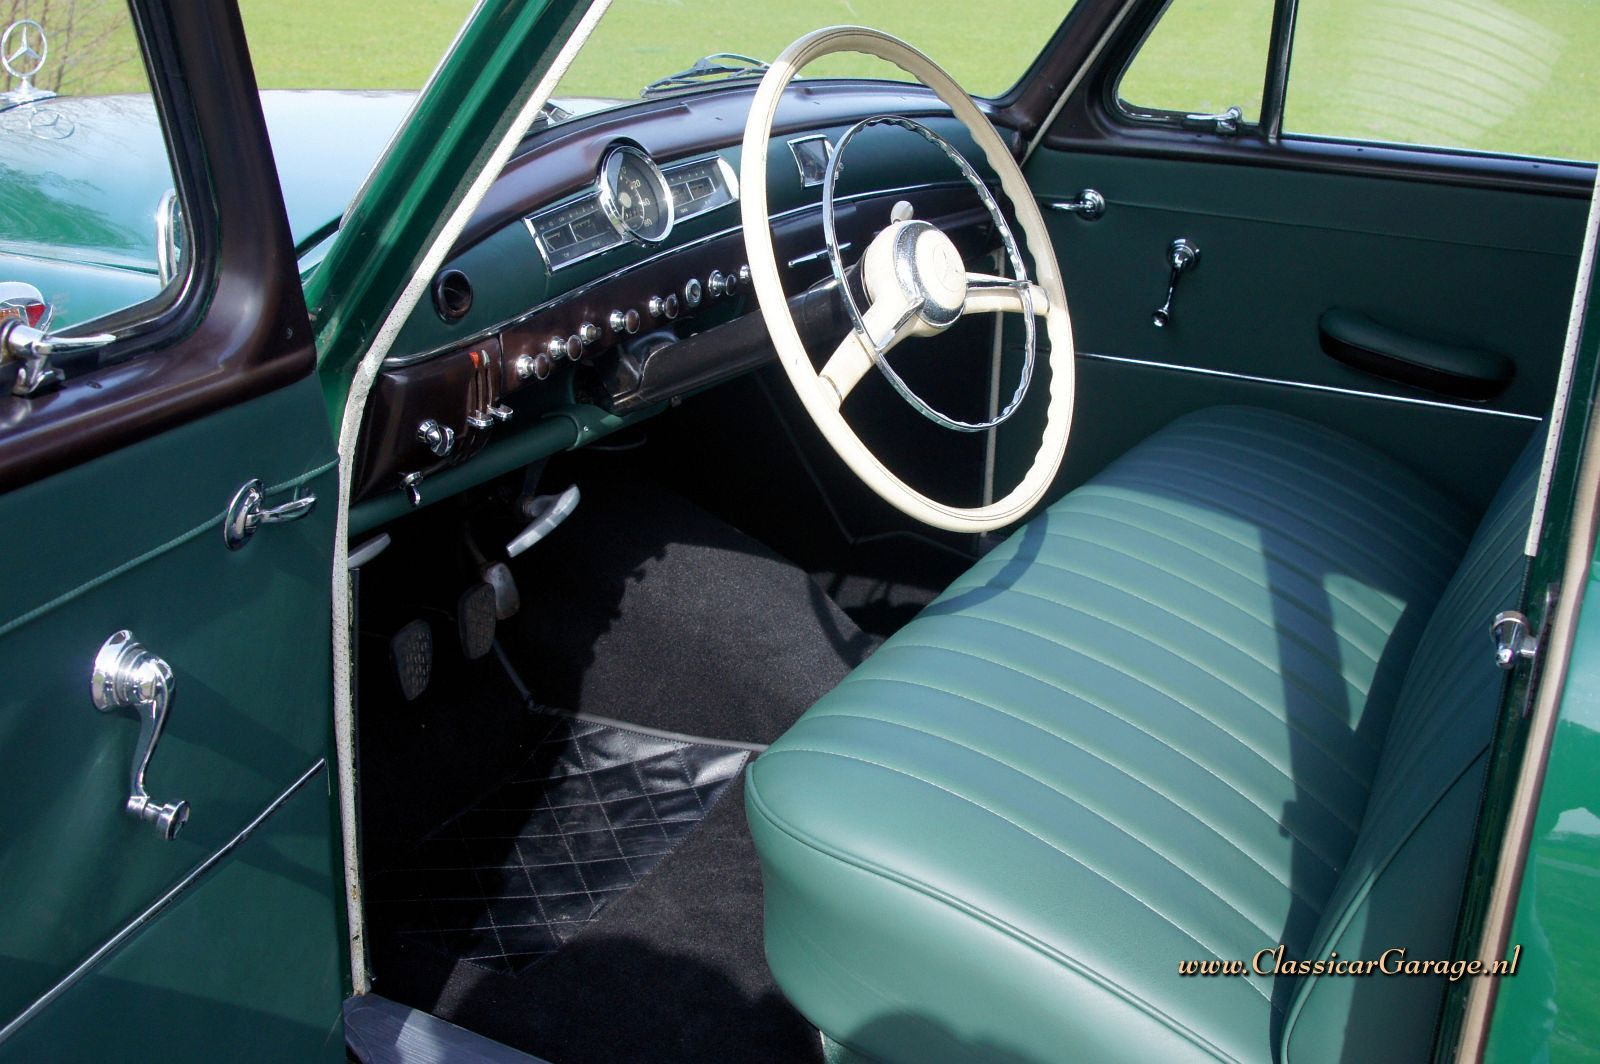 Mercedes-Benz 180 (W120 ponton), 1958 details